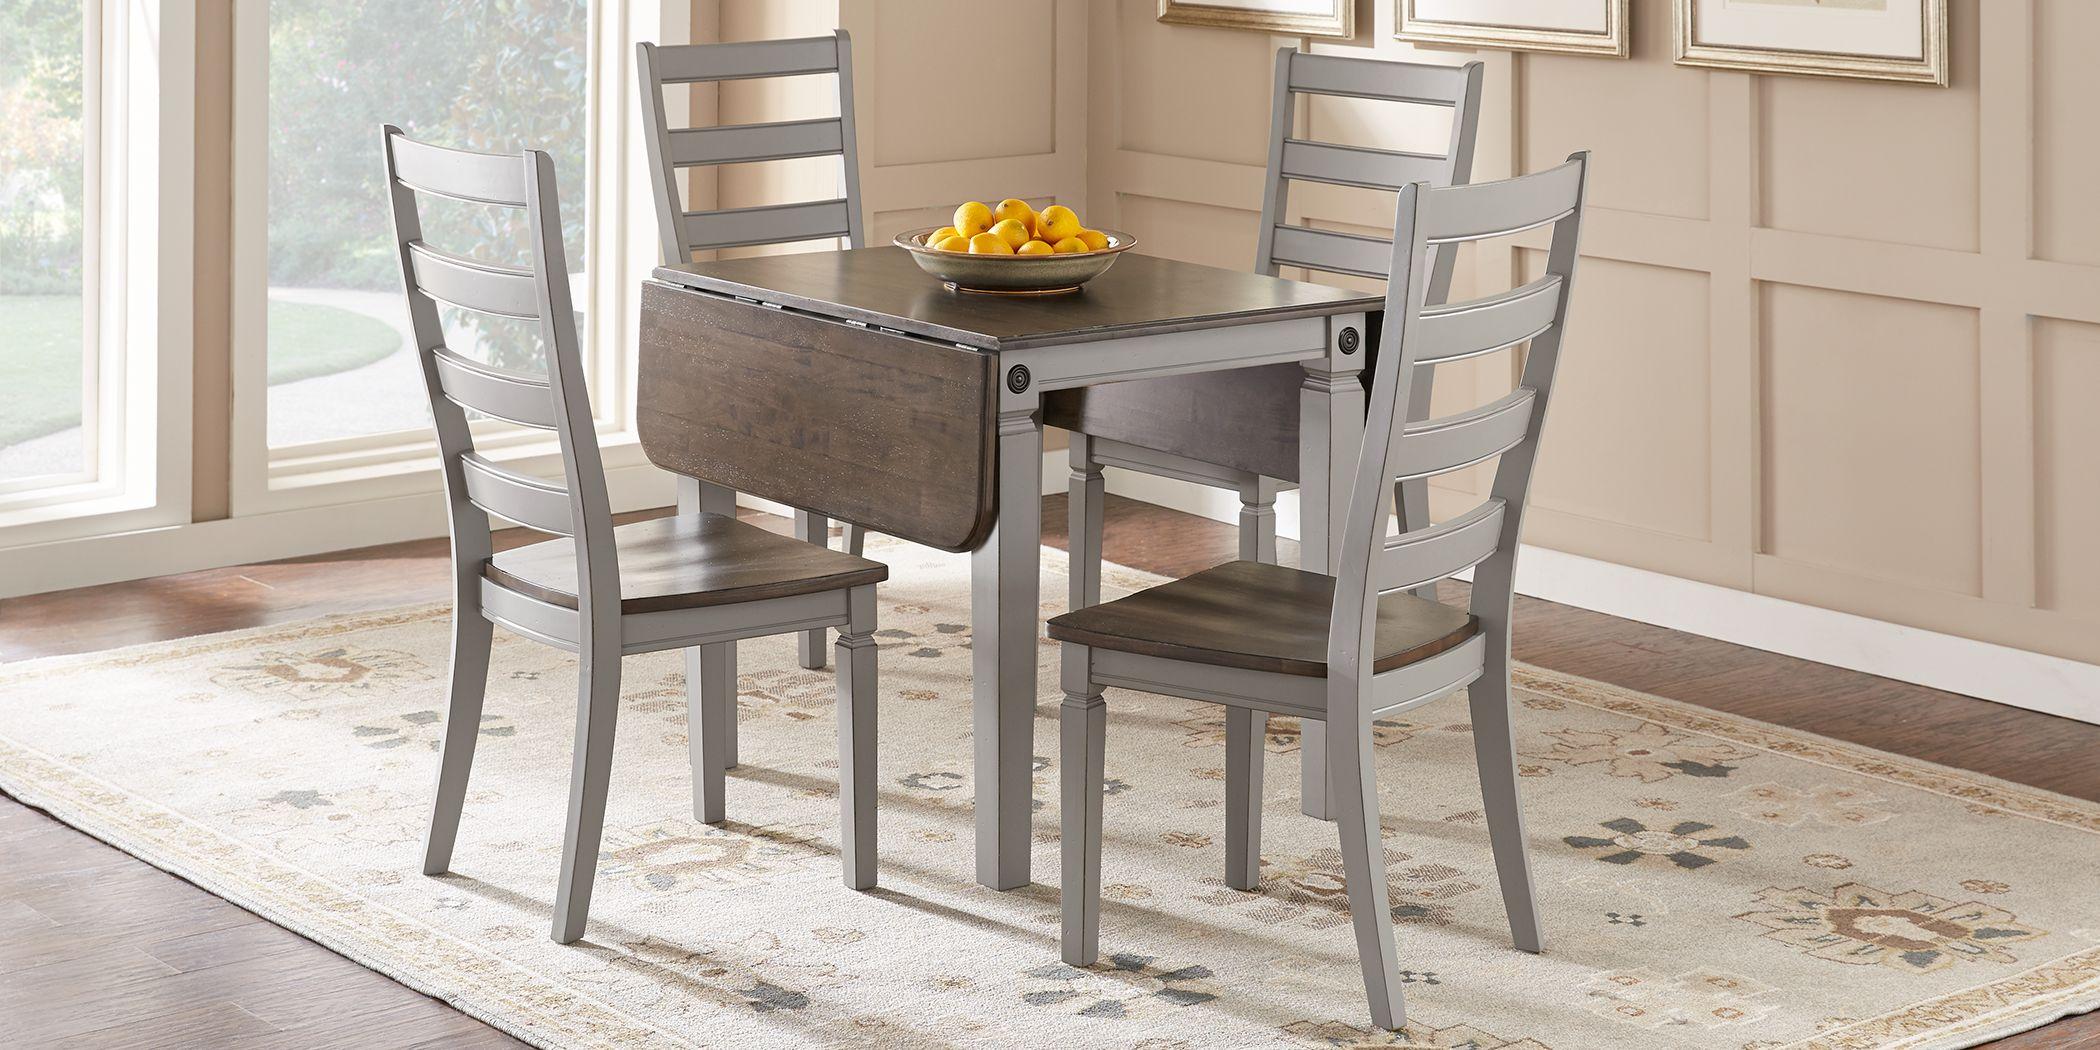 Velino Gray 5 Pc Rectangle Dining Set